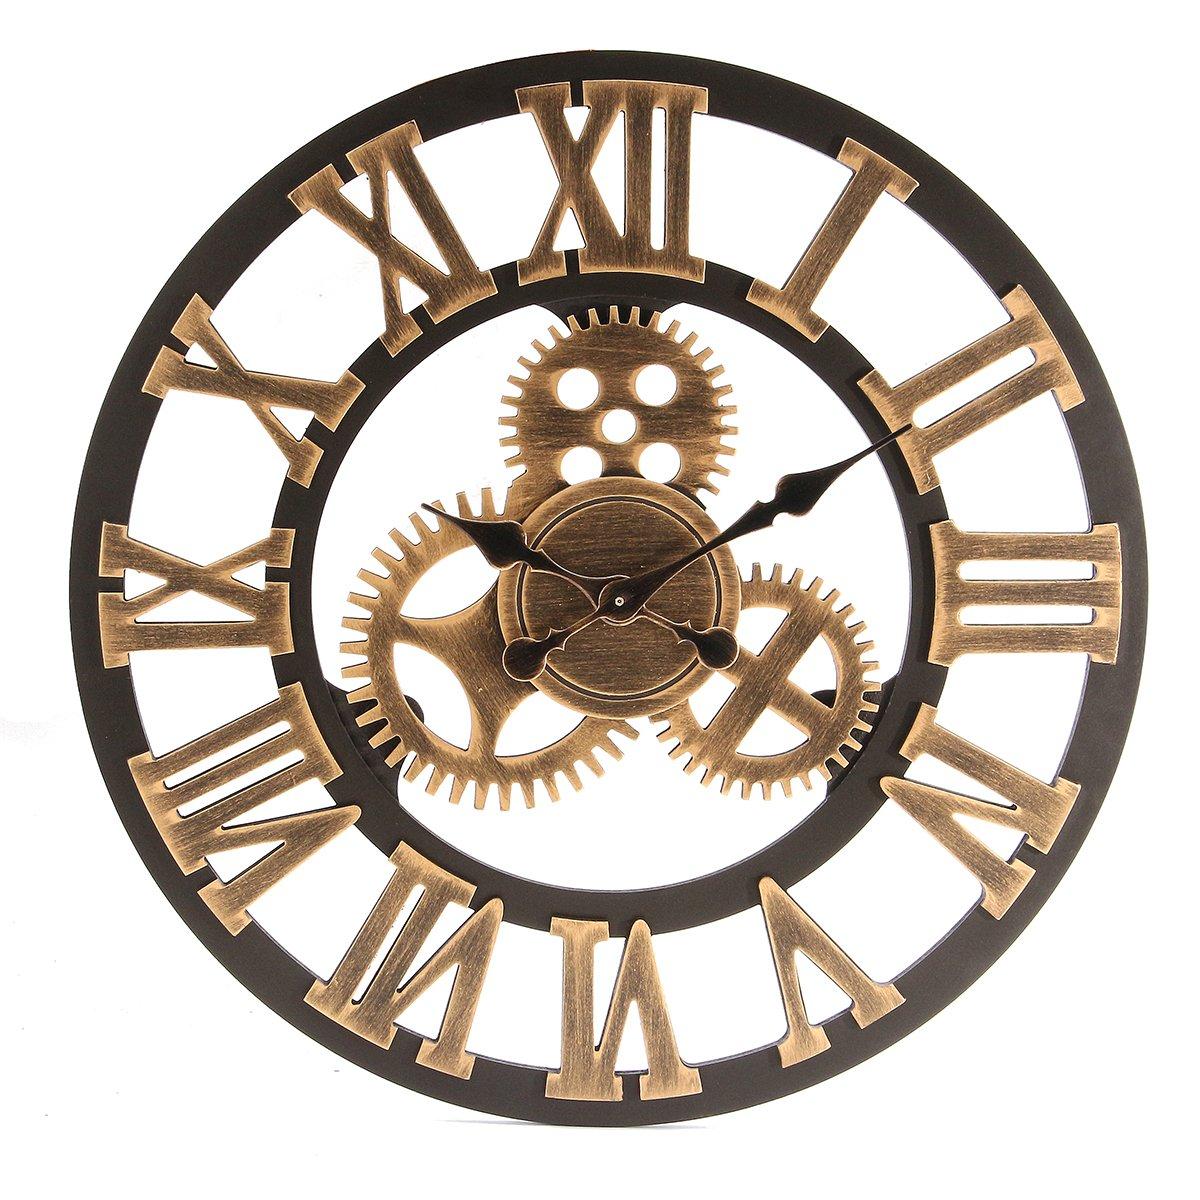 Jeteven 60cm Wanduhr Europäische Europäische Europäische Vintage Handarbeit 3D Dekorative Zahnrad aus Holz Gold 99ba50